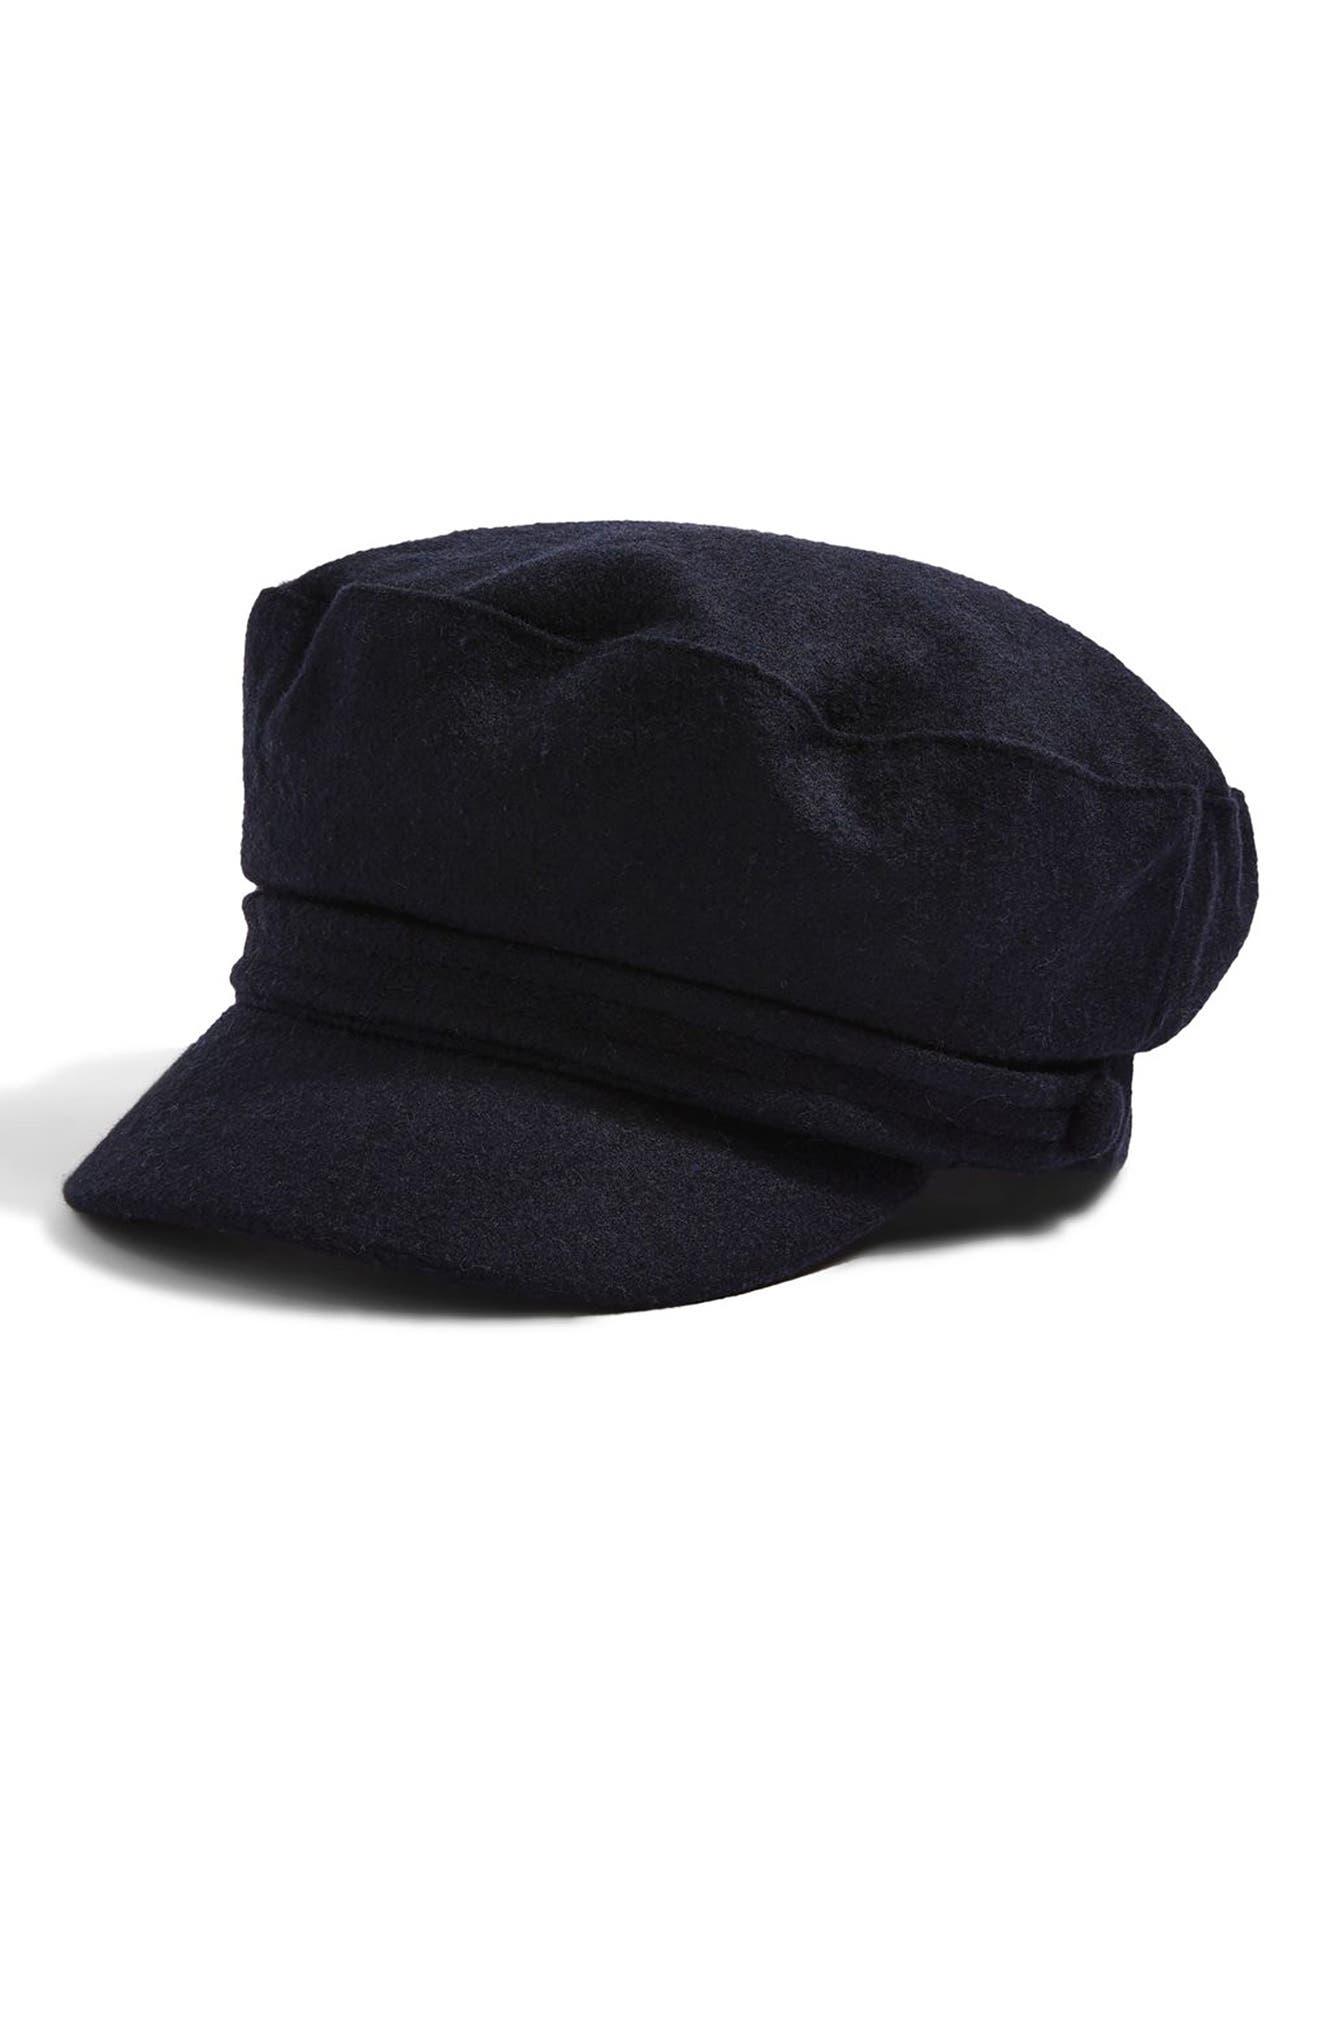 Alternate Image 1 Selected - Topshop Baker Boy Cap